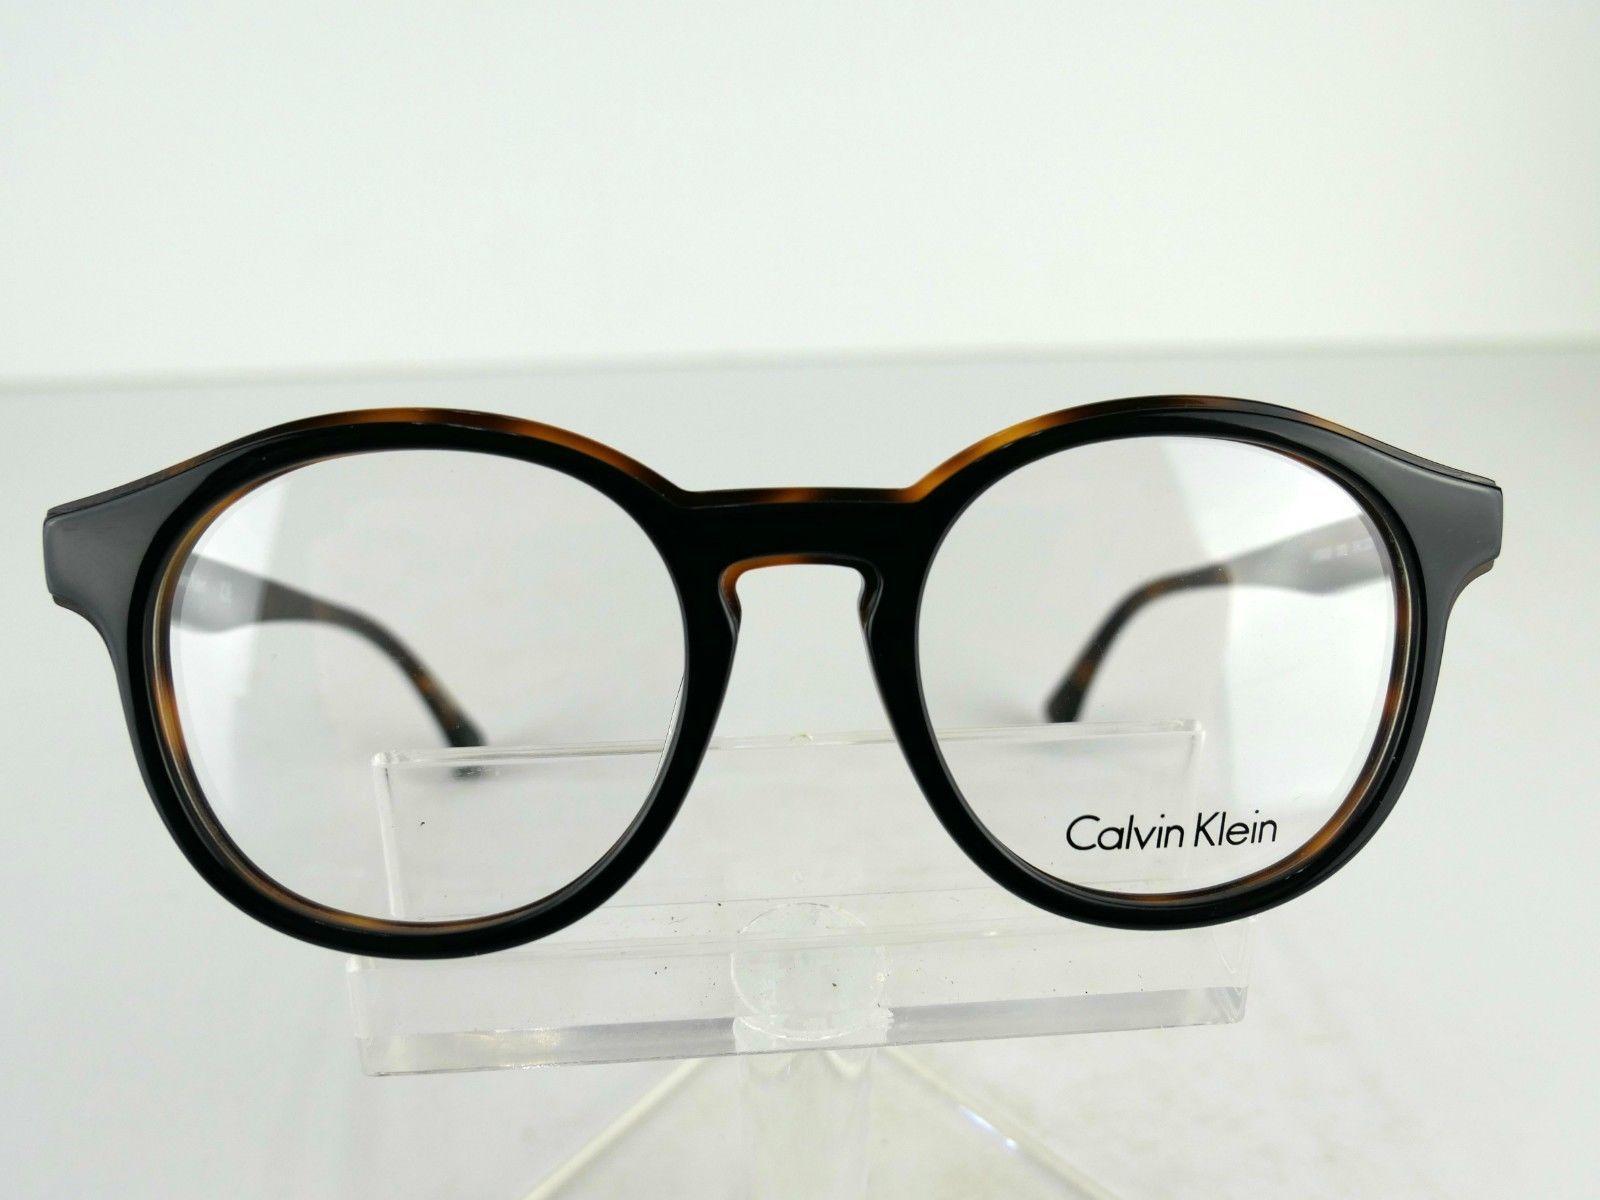 CALVIN KLEIN ck 5932 (003) Black / Tortoise 51 X 20 140 mm Eyeglass Frame